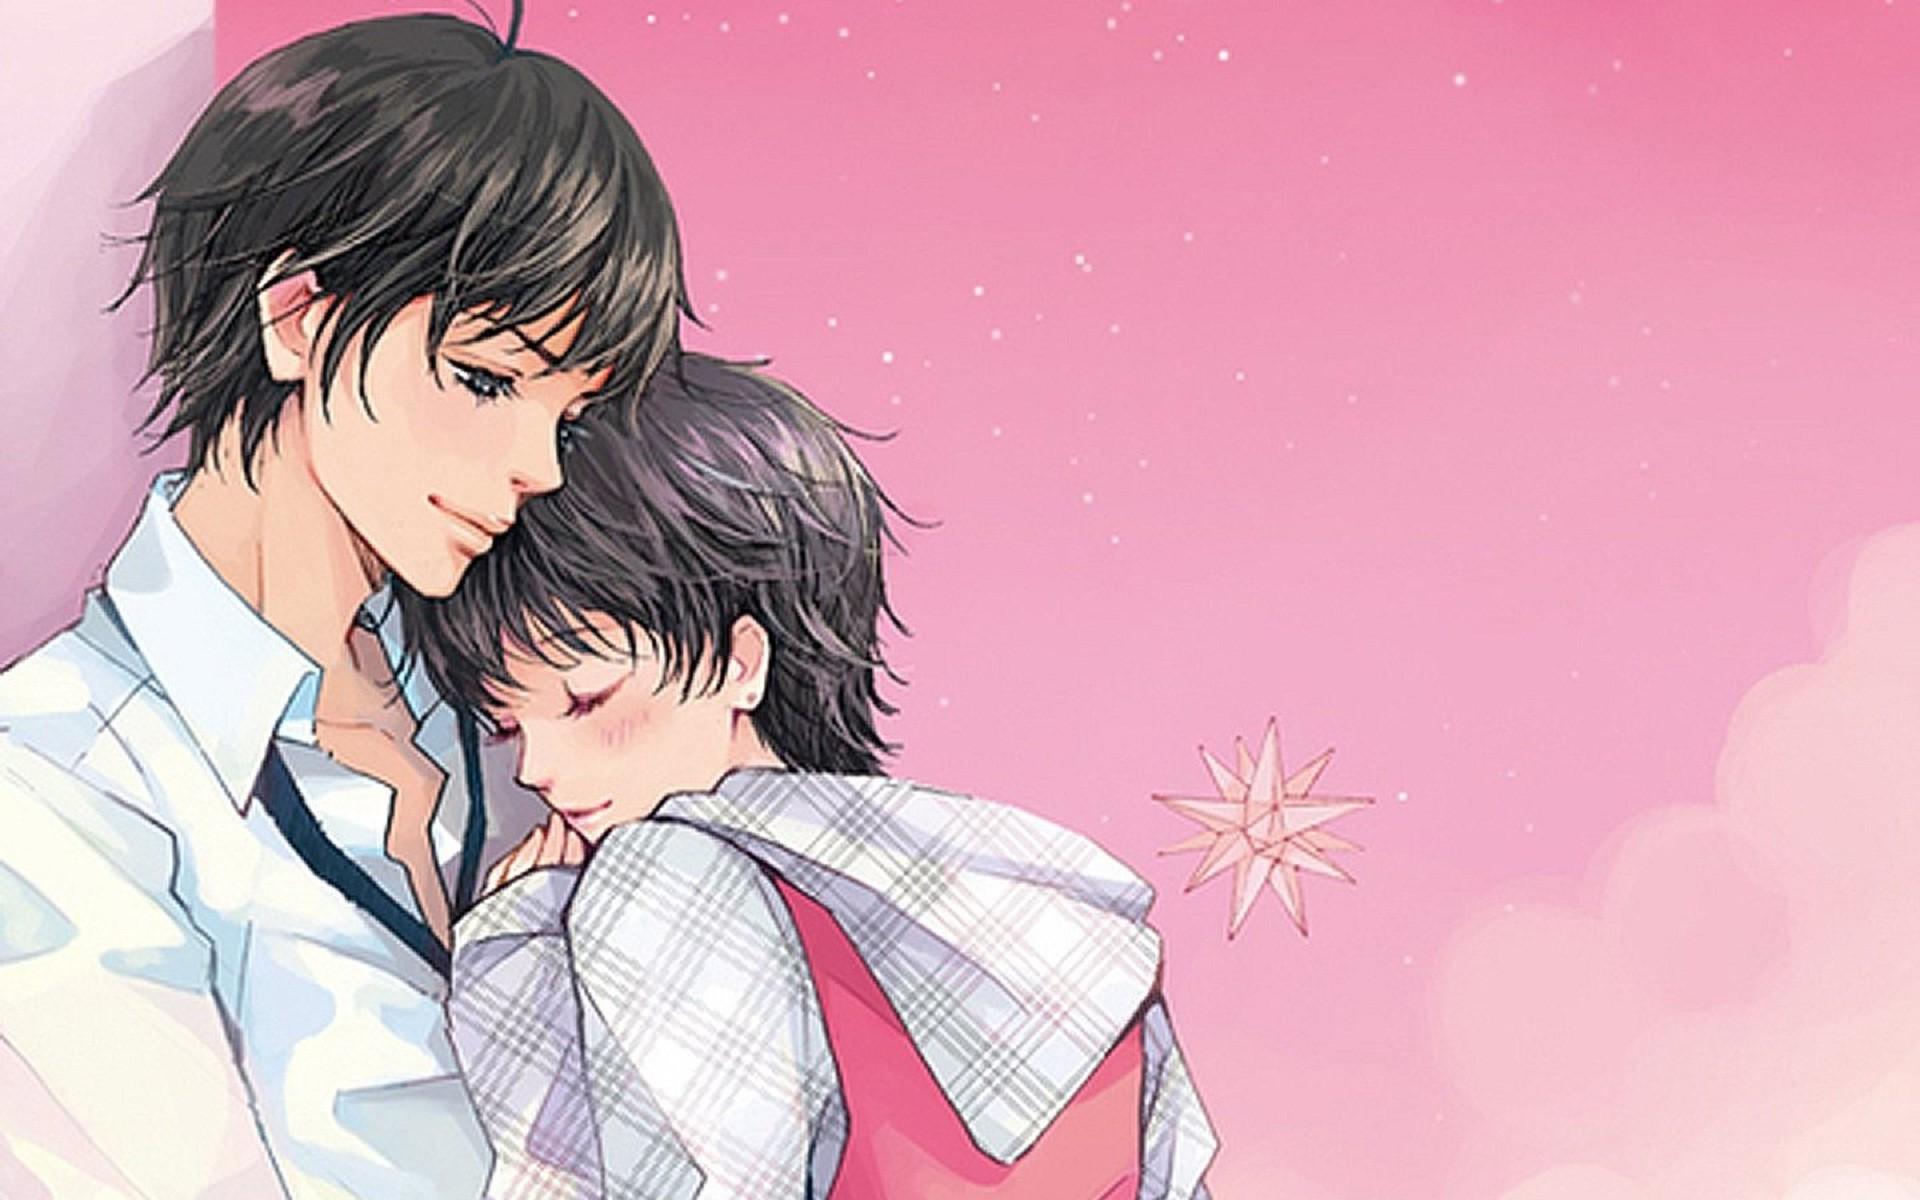 Sweet Romantic Young Couple Hugs Wallpapers | HD Wallpapers Rocks